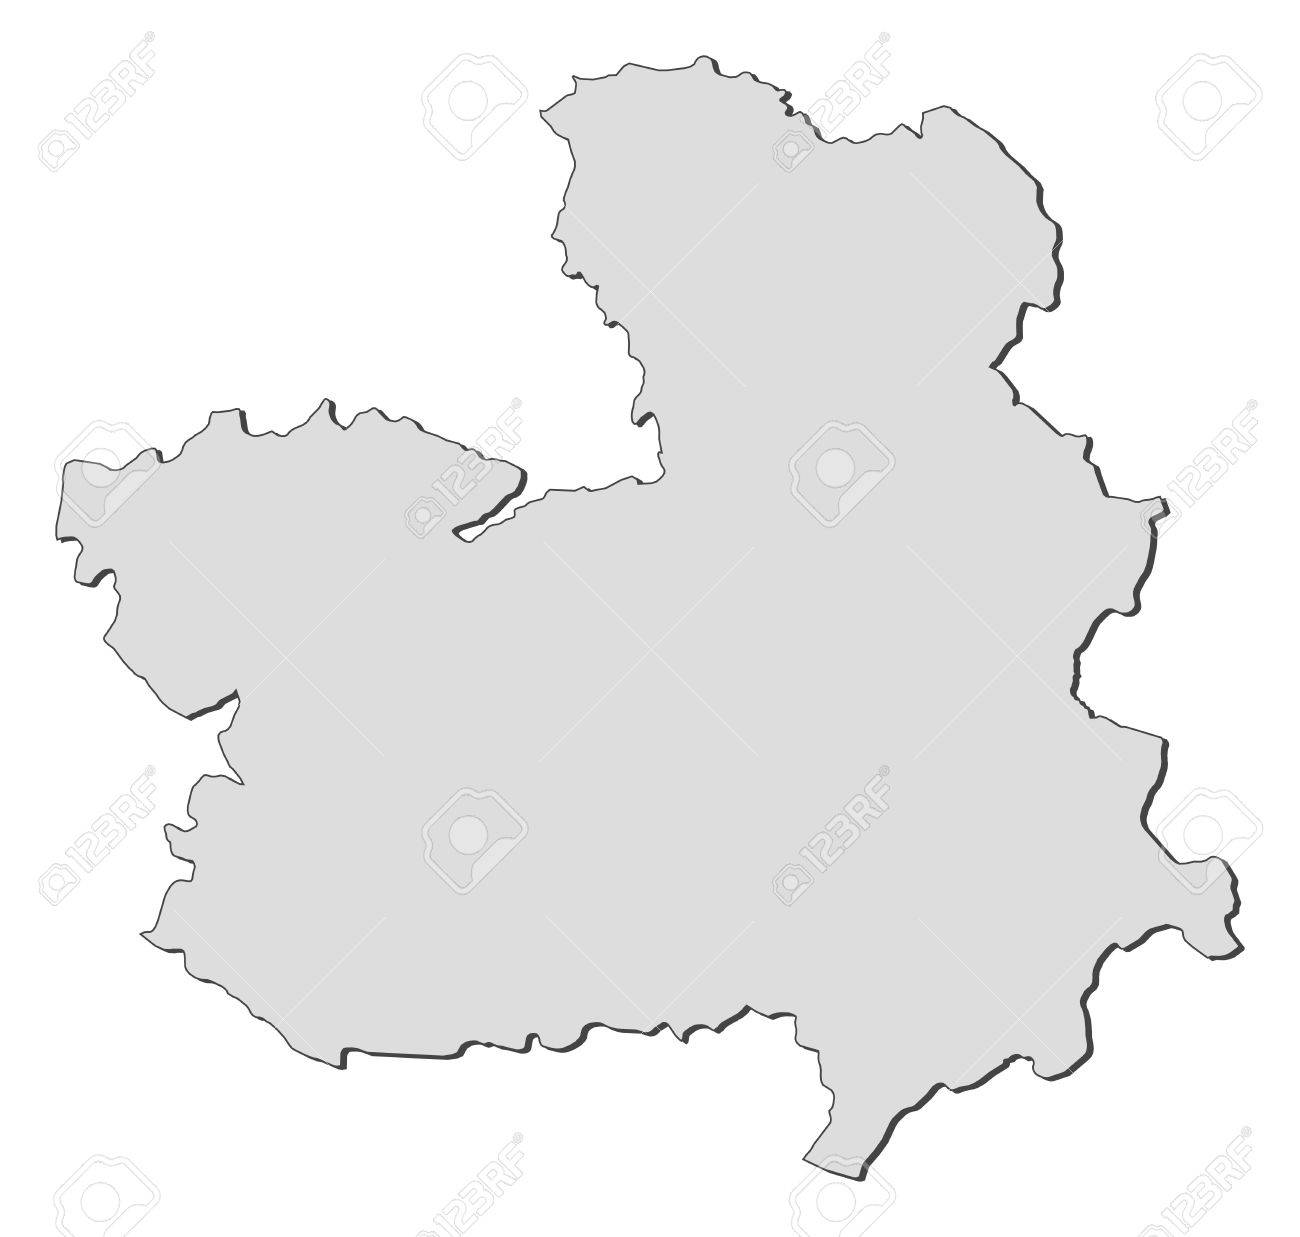 La Mancha Spain Map.Map Of Castile La Mancha A Region Of Spain Royalty Free Cliparts